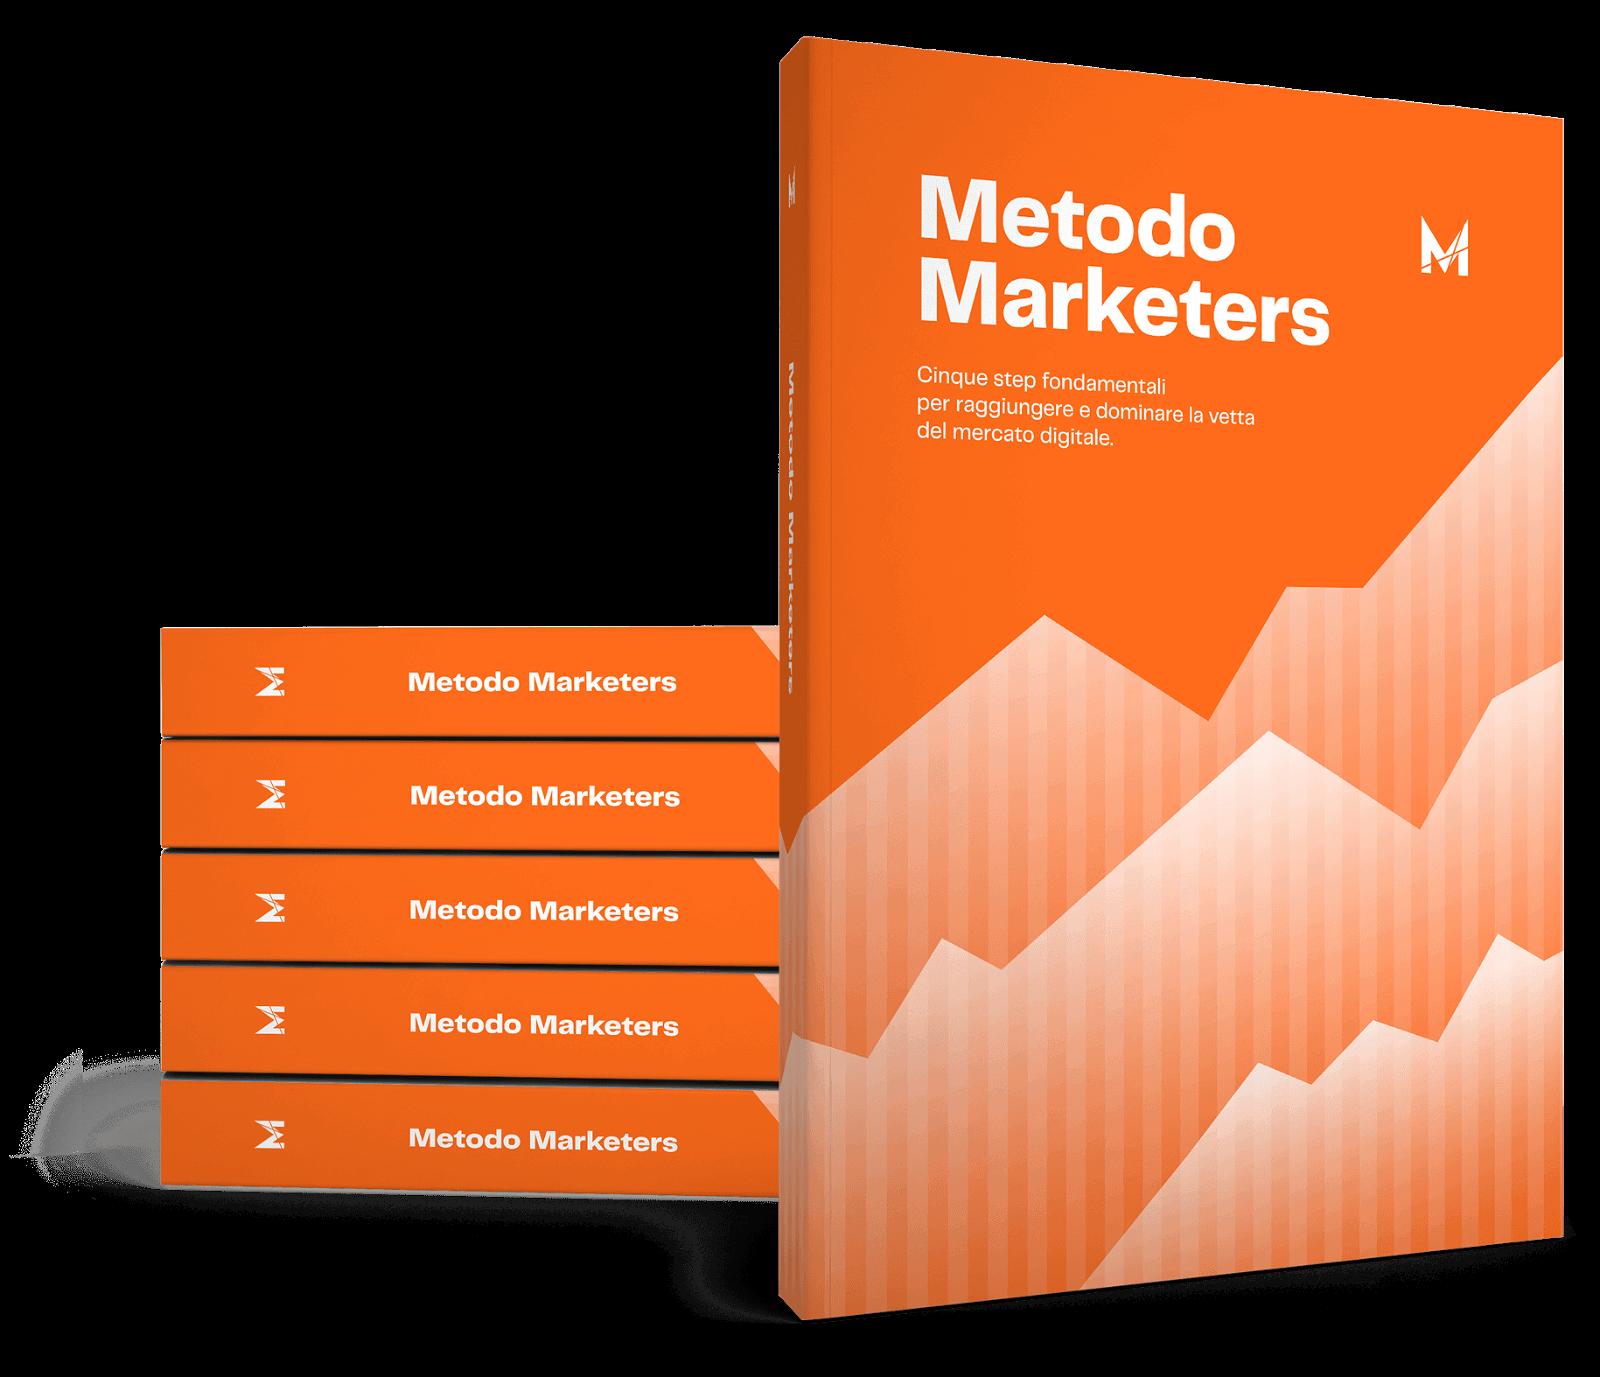 Metodo Marketers 2